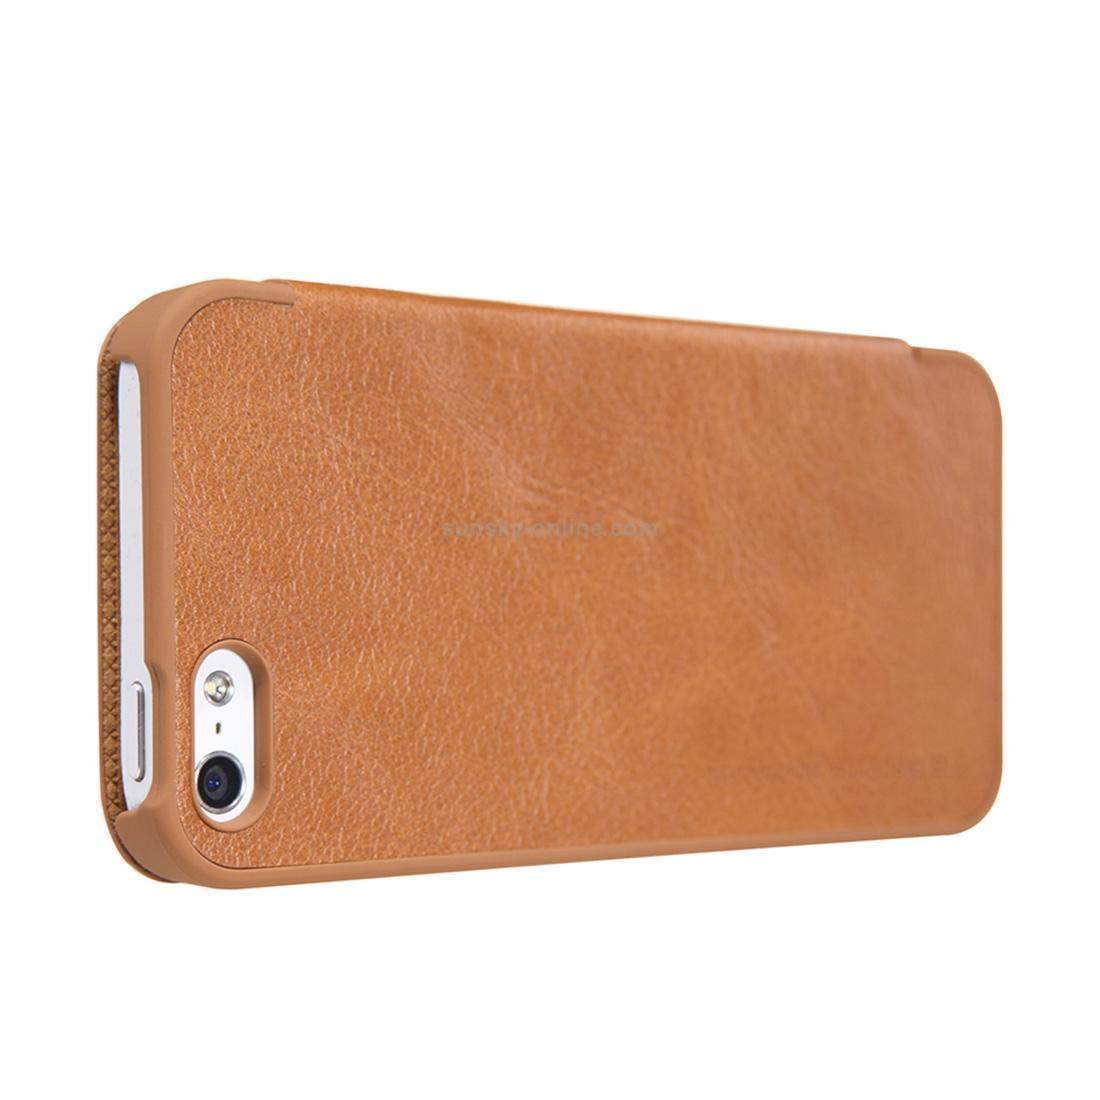 Чехол-пенал Heddy Luxury Hard Box для Apple iPhone SE/5S/5 натуральная кожа, коричневыйдля iPhone 5/5S/SE<br>Чехол-пенал Heddy Luxury Hard Box для Apple iPhone SE/5S/5 натуральная кожа, коричневый<br>